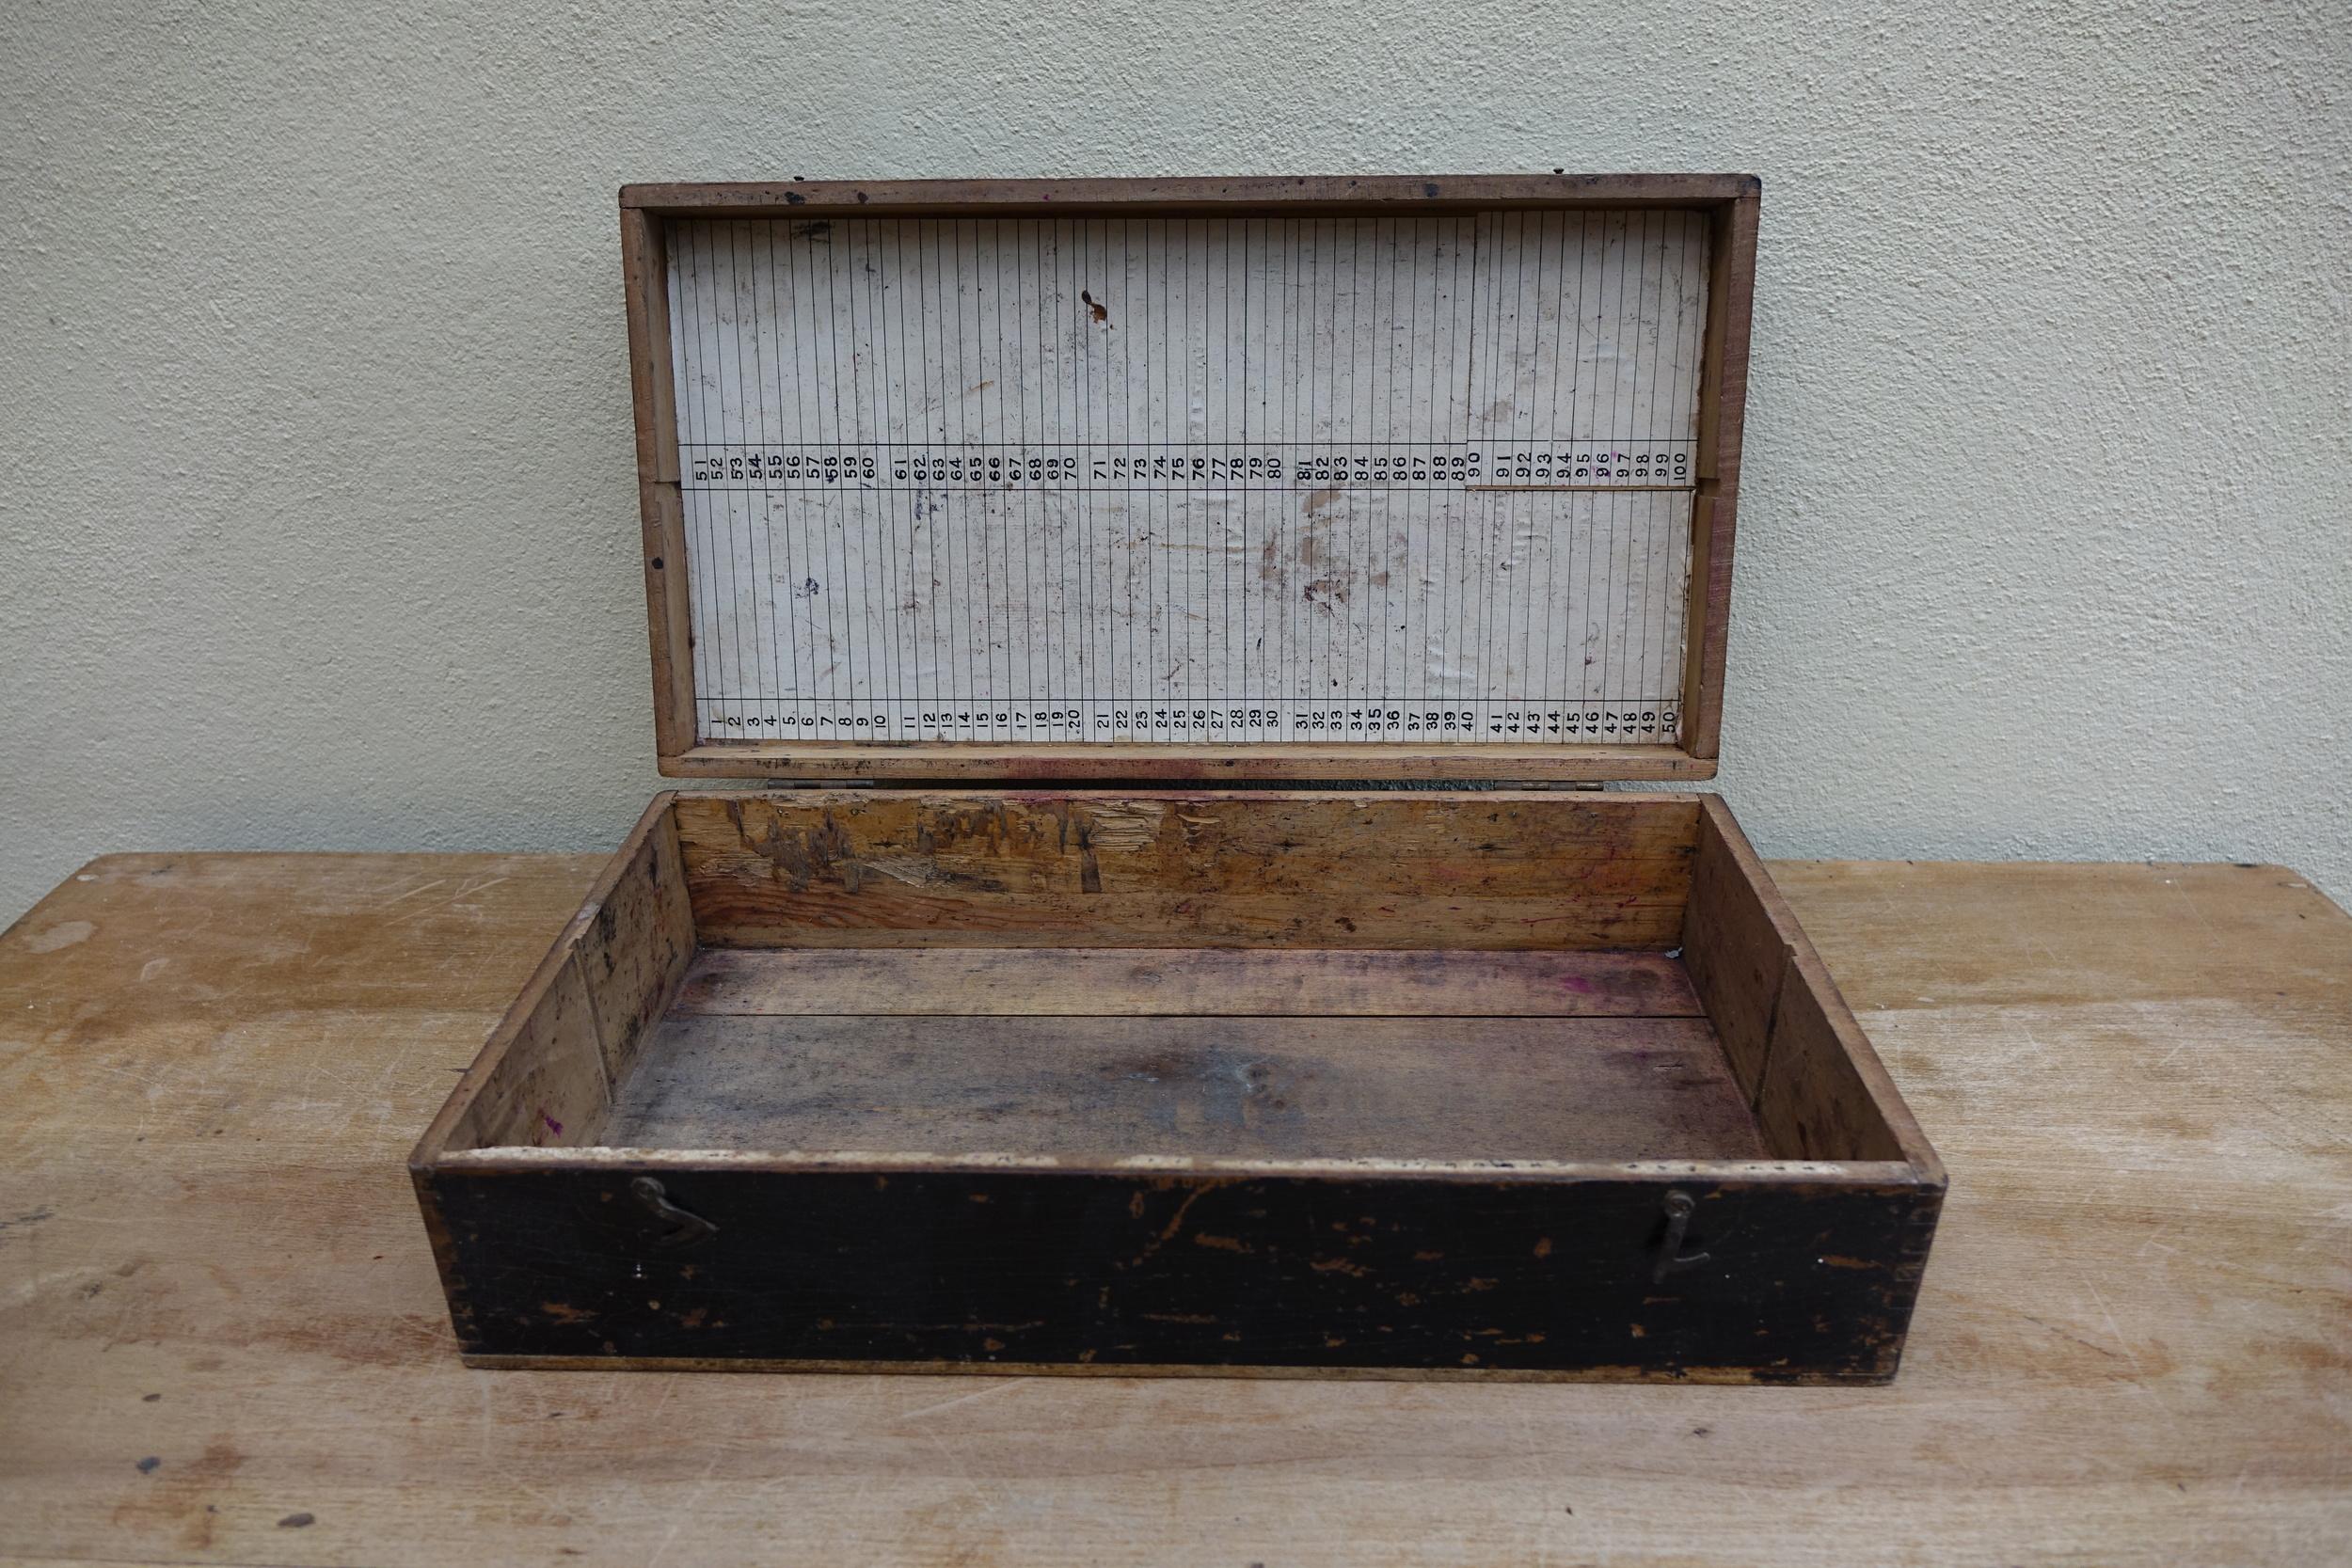 Vintage Wooden Suitcase £5